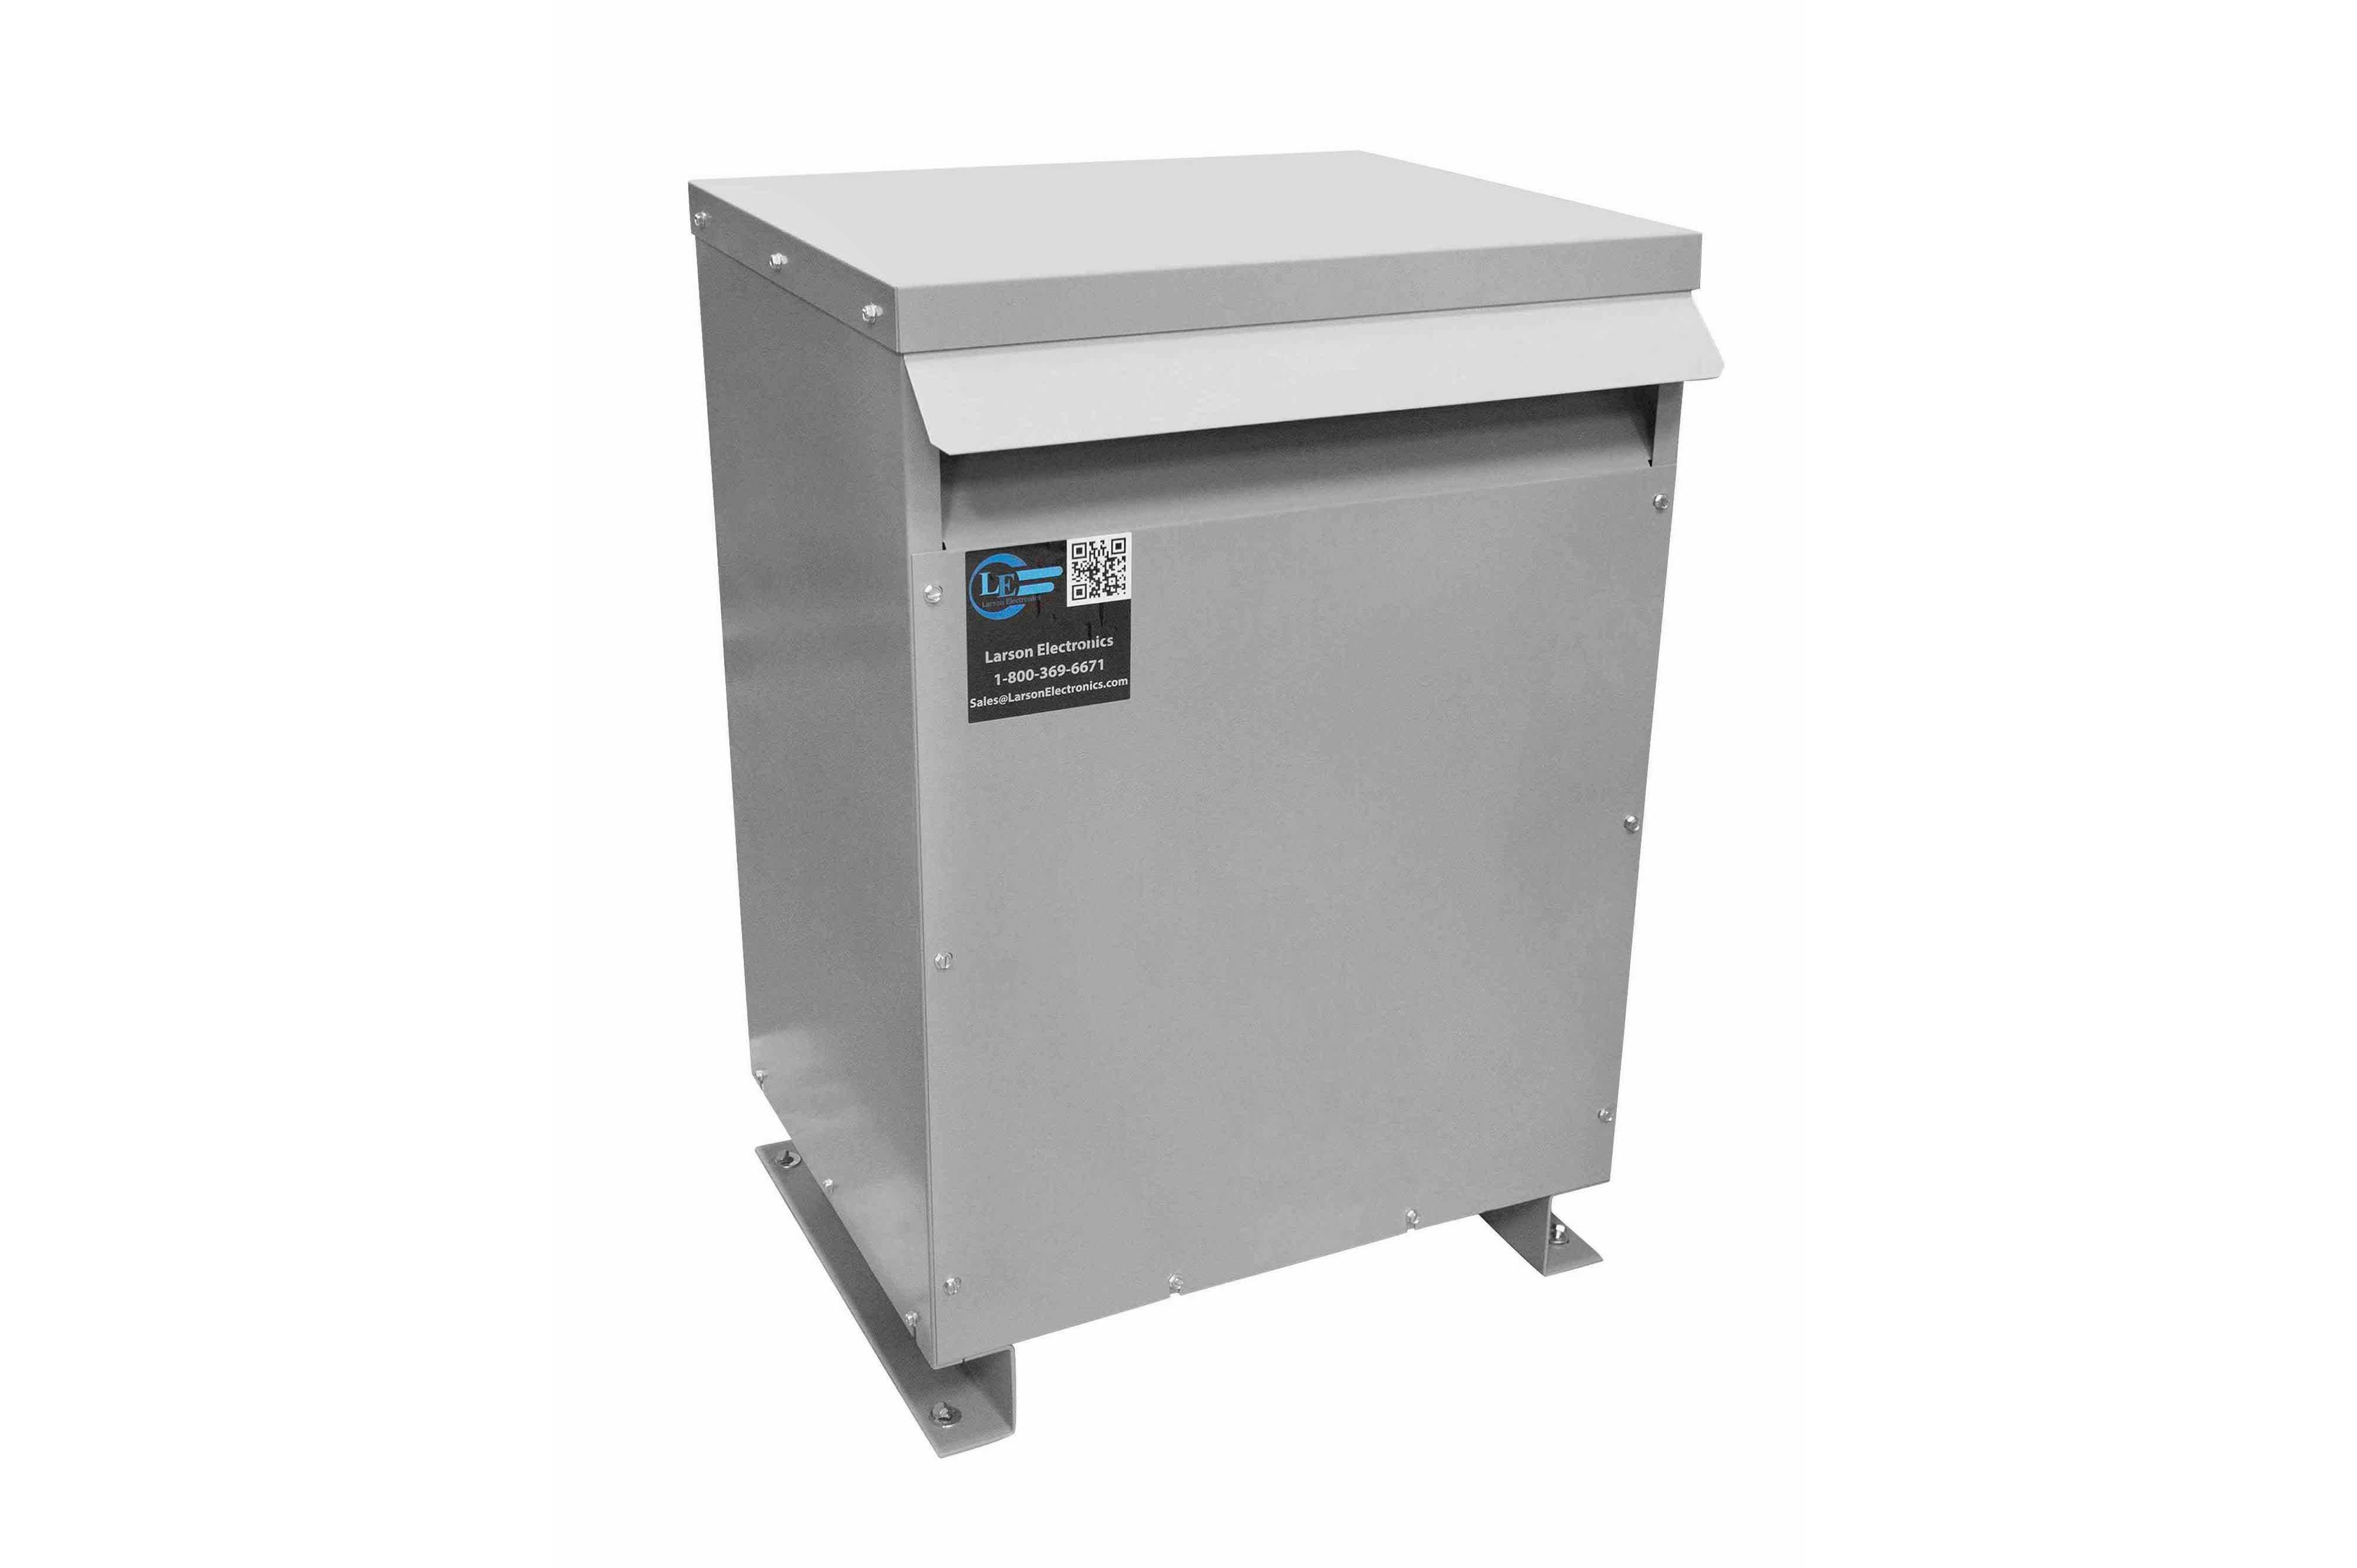 115 kVA 3PH Isolation Transformer, 460V Wye Primary, 400V Delta Secondary, N3R, Ventilated, 60 Hz